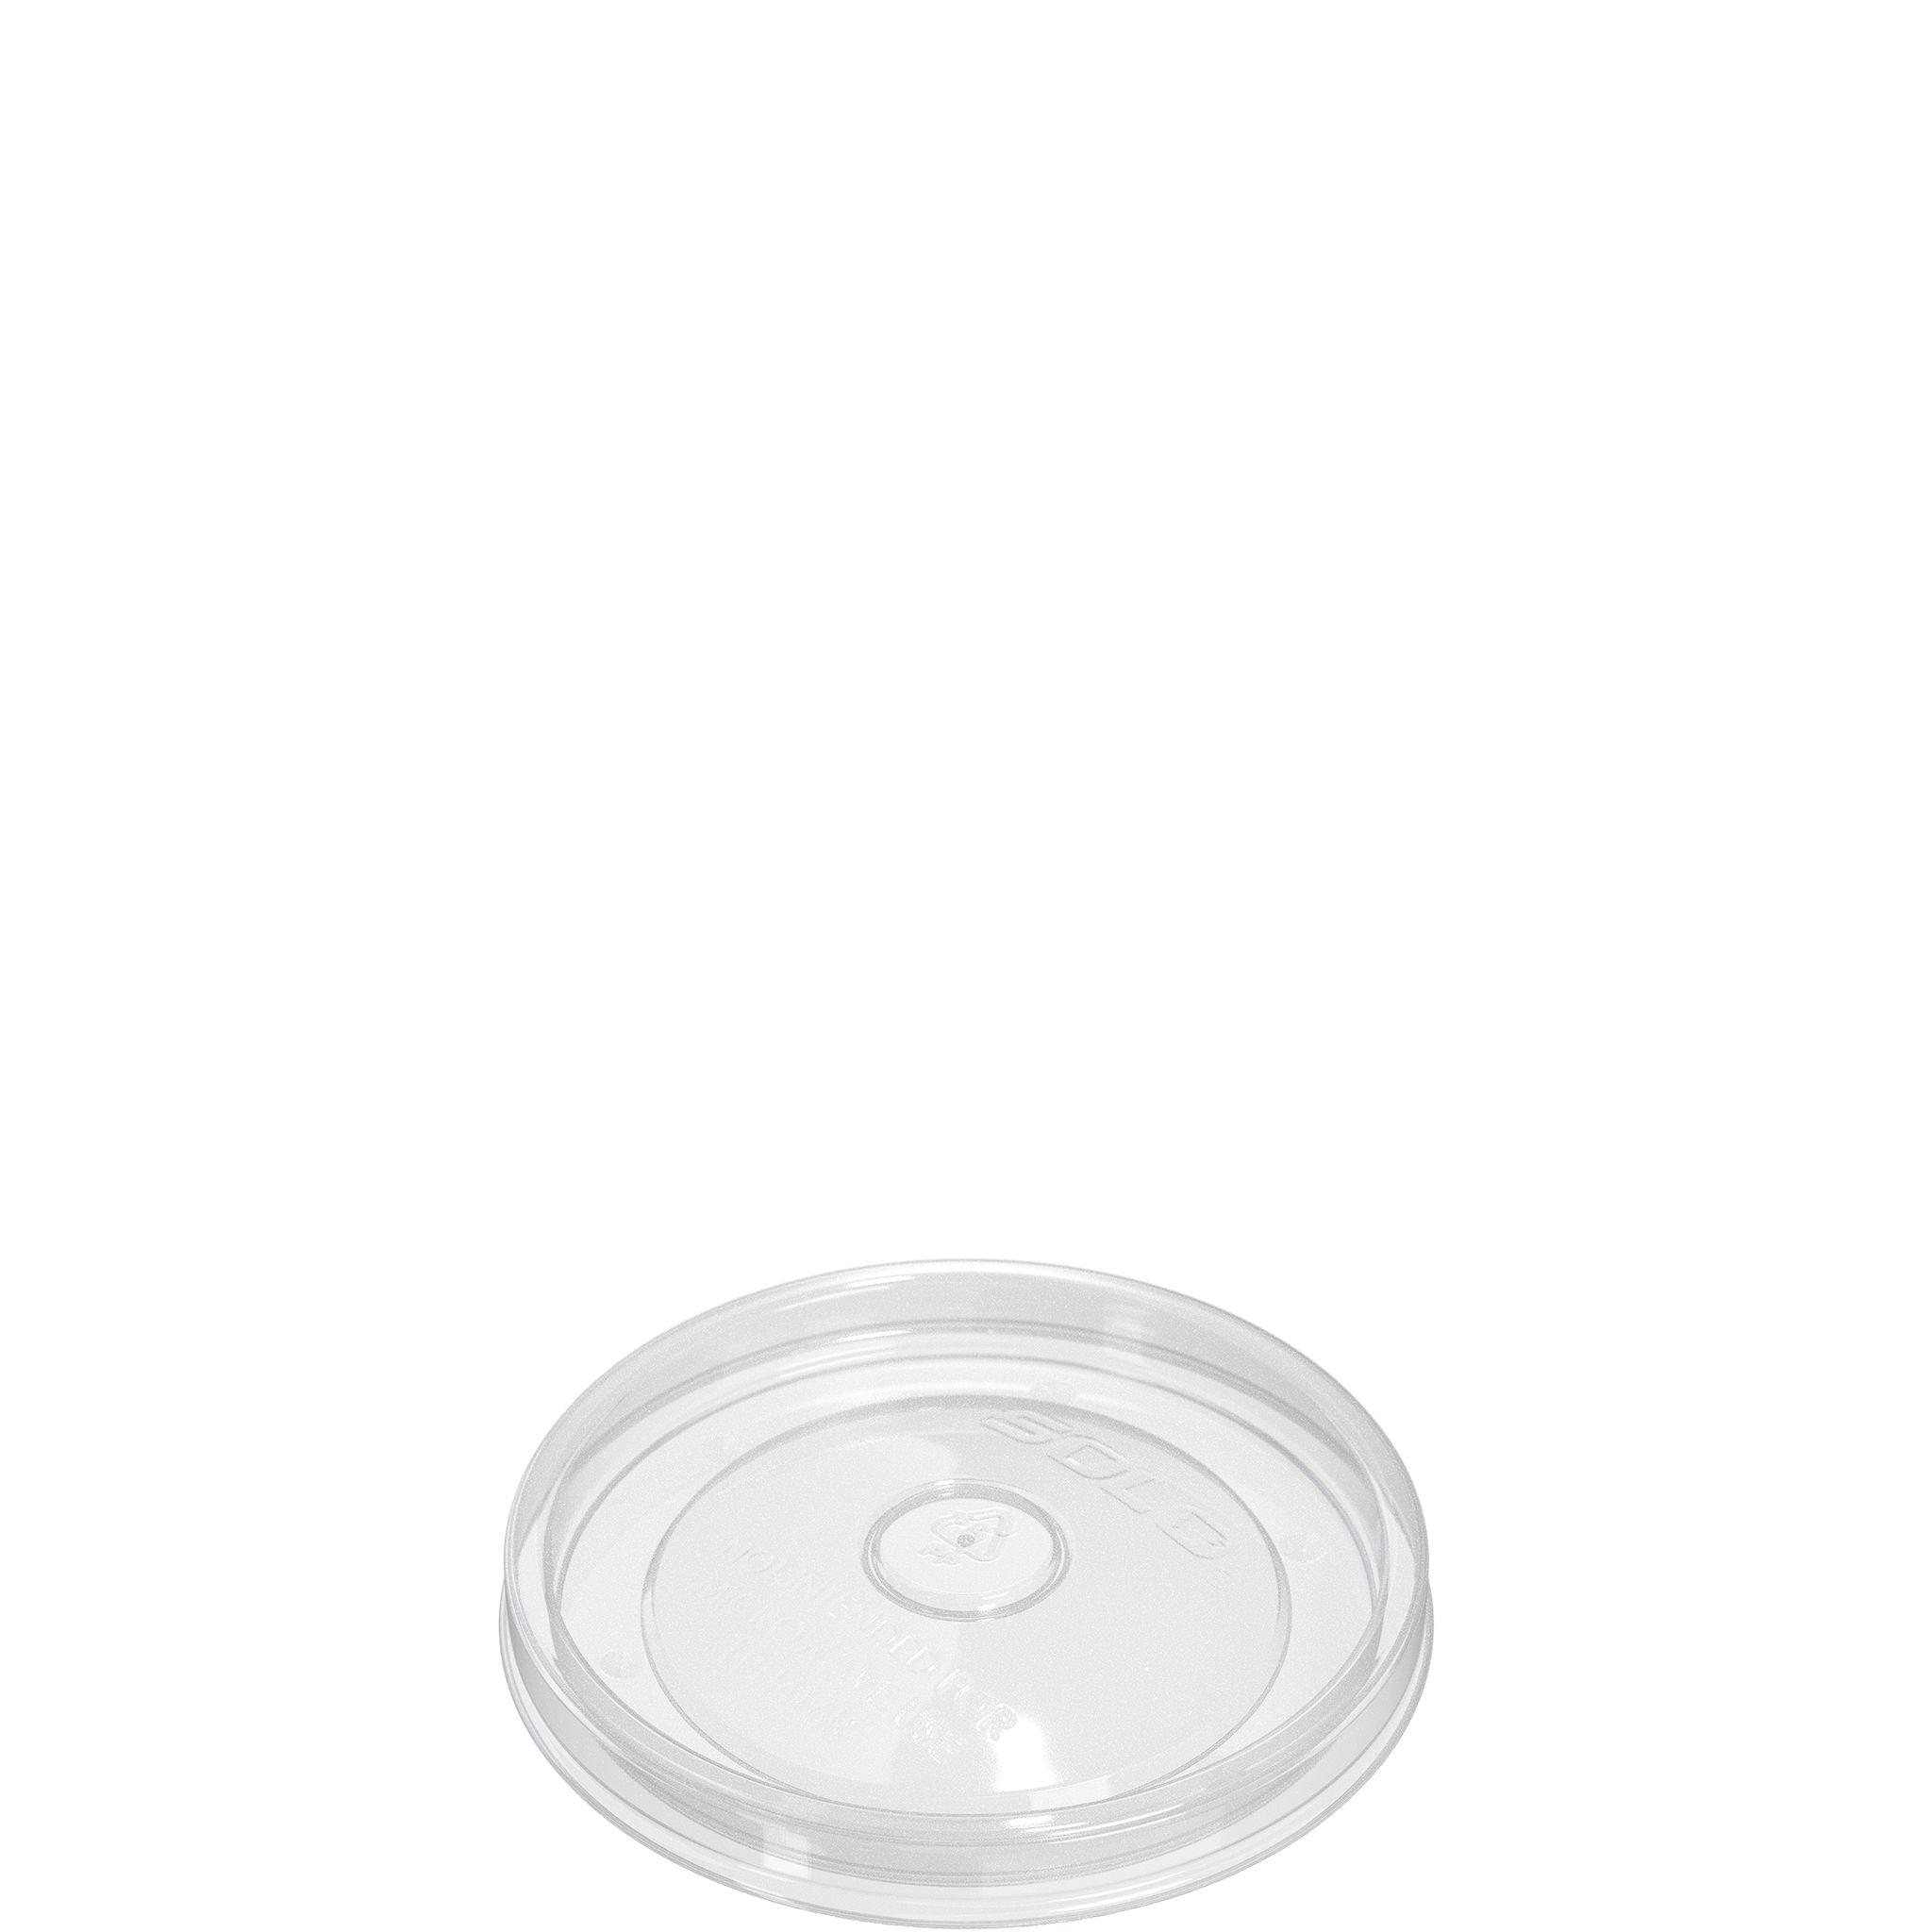 LPH416-0090